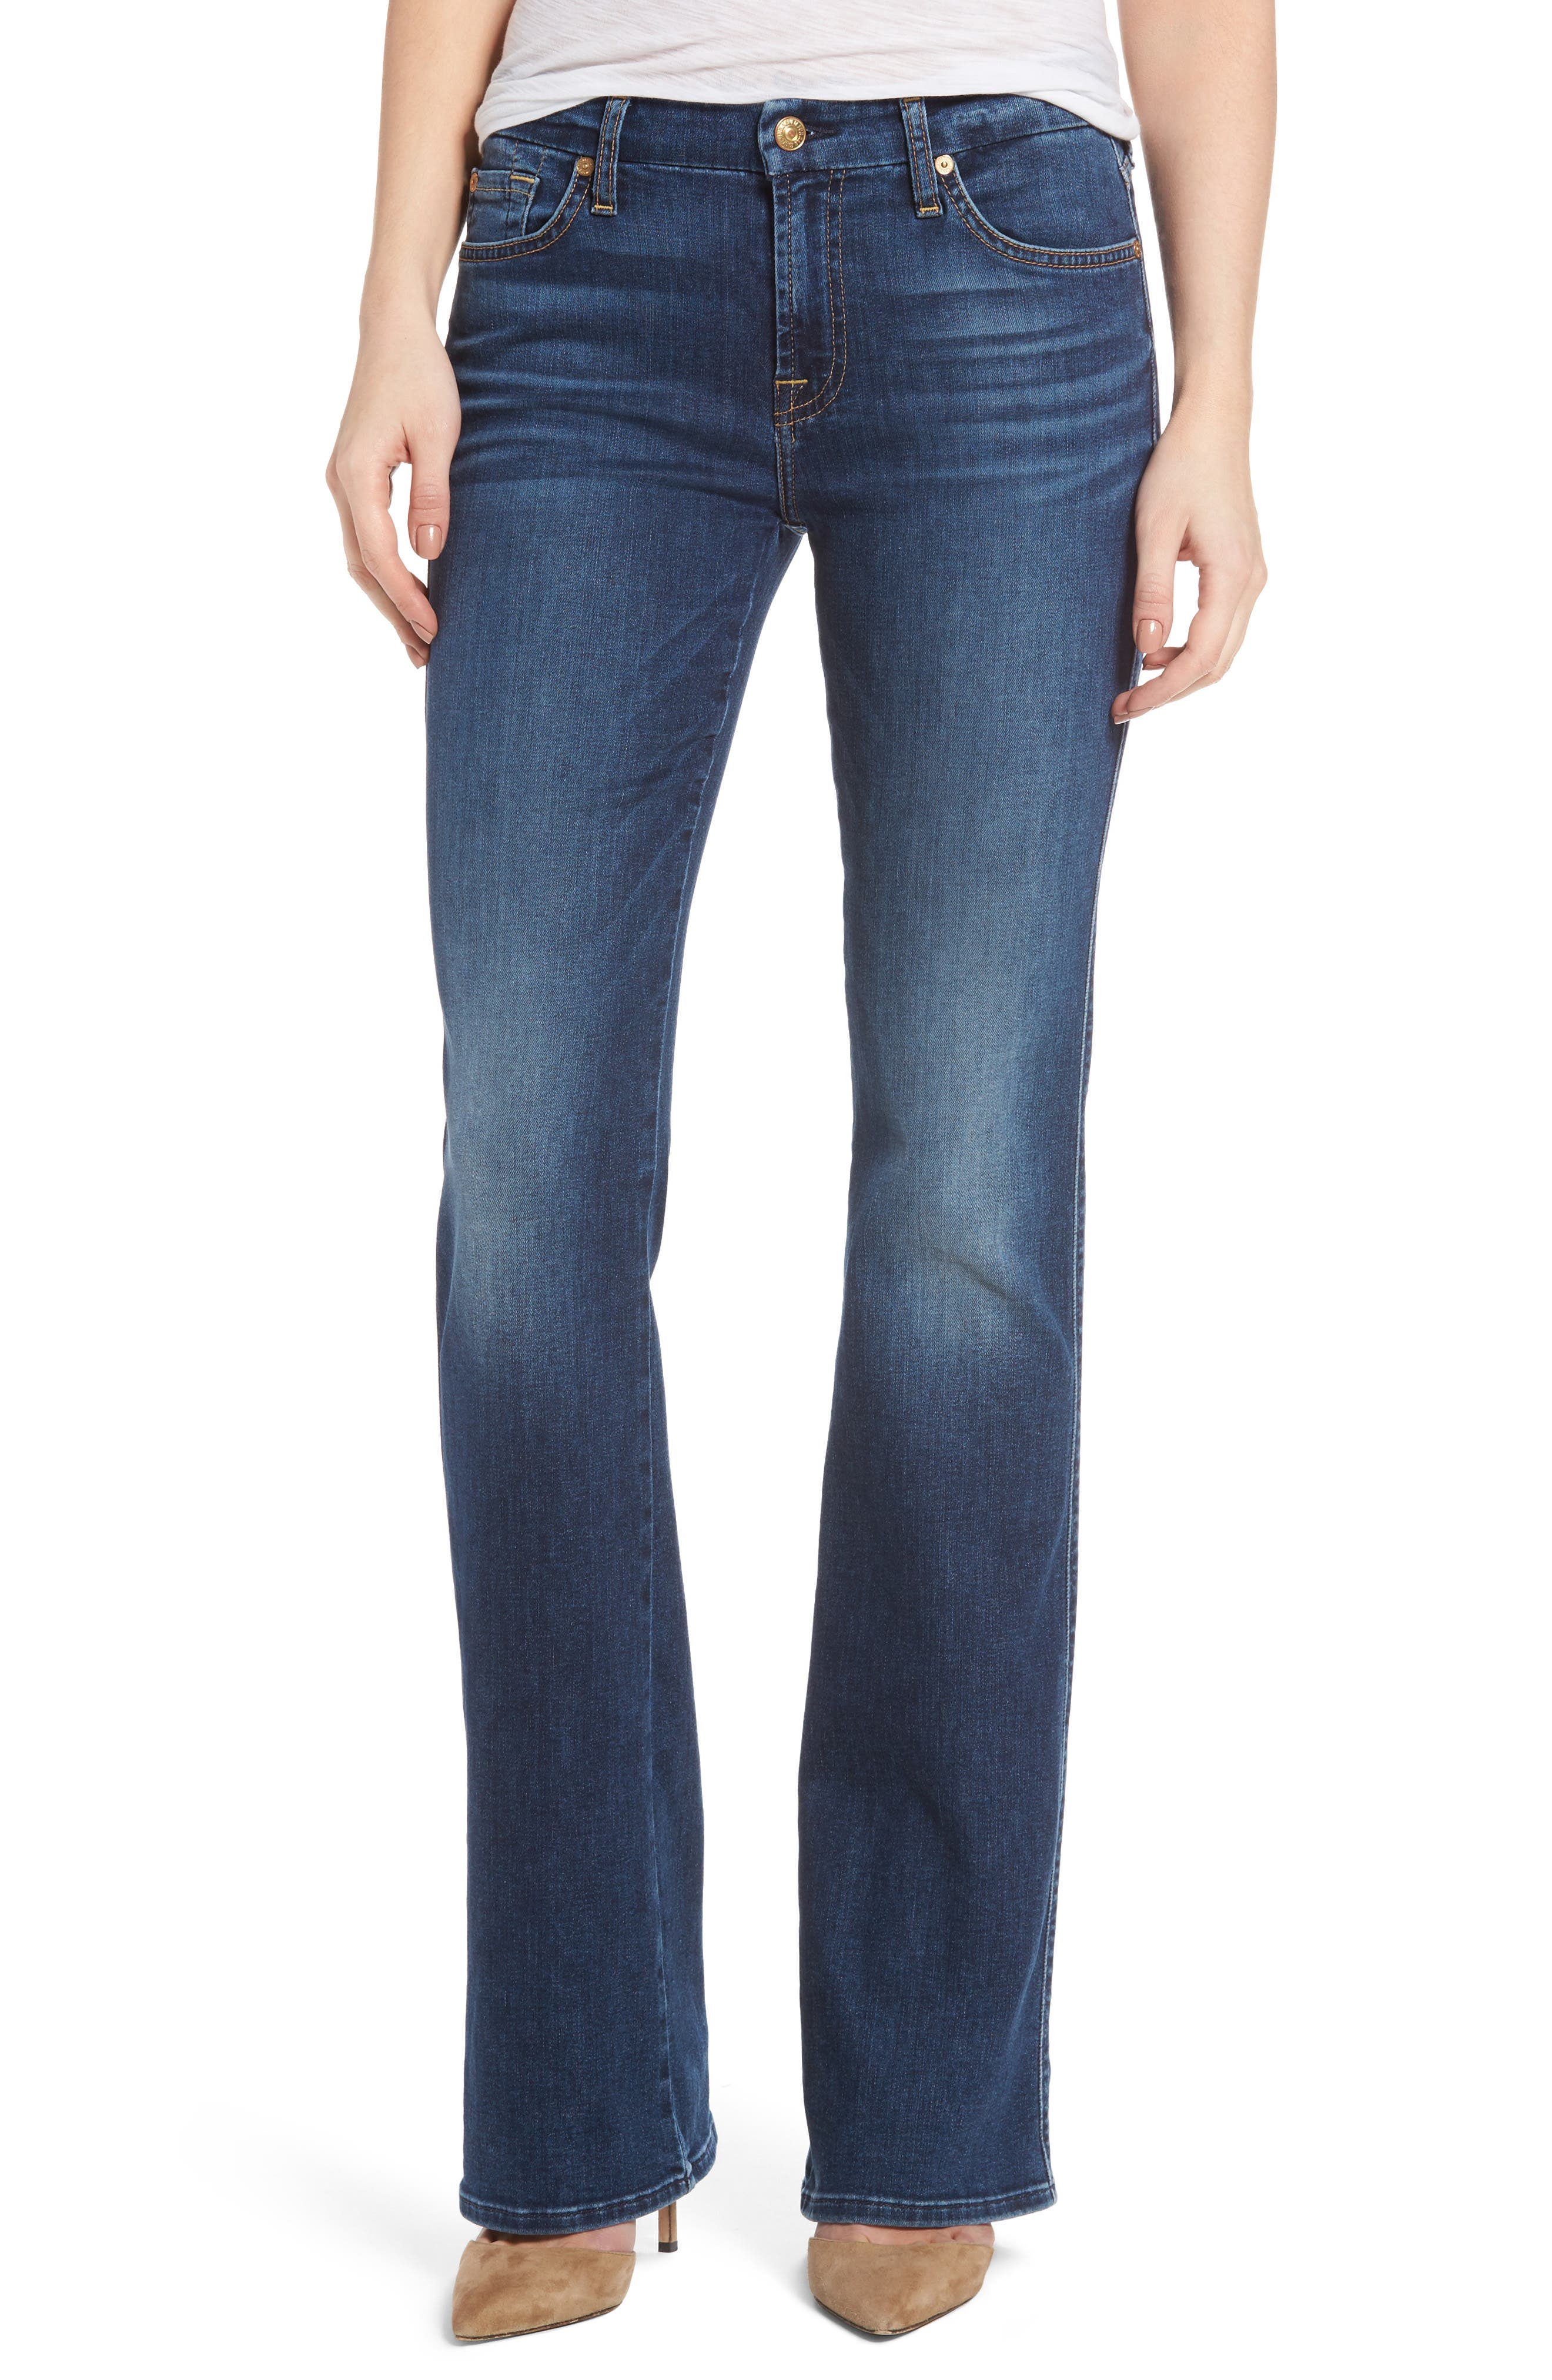 Kimmie Bootcut Jeans,                             Main thumbnail 1, color,                             400